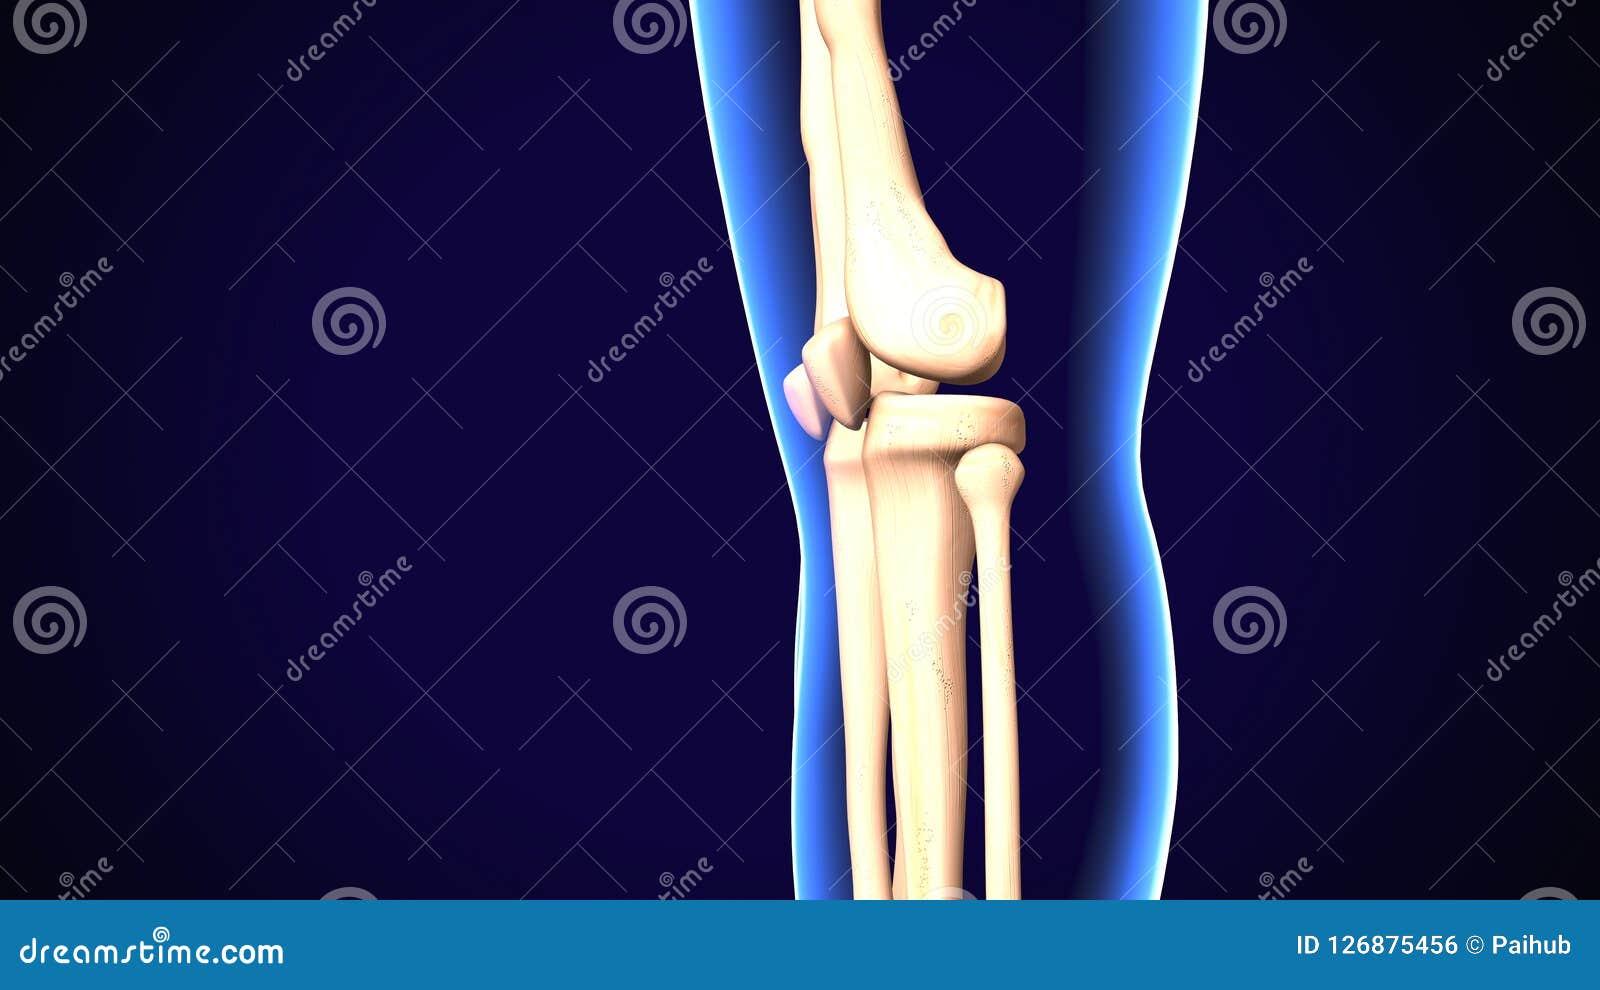 3d Rendered Anatomy Illustration Of A Human Knee Stock Illustration